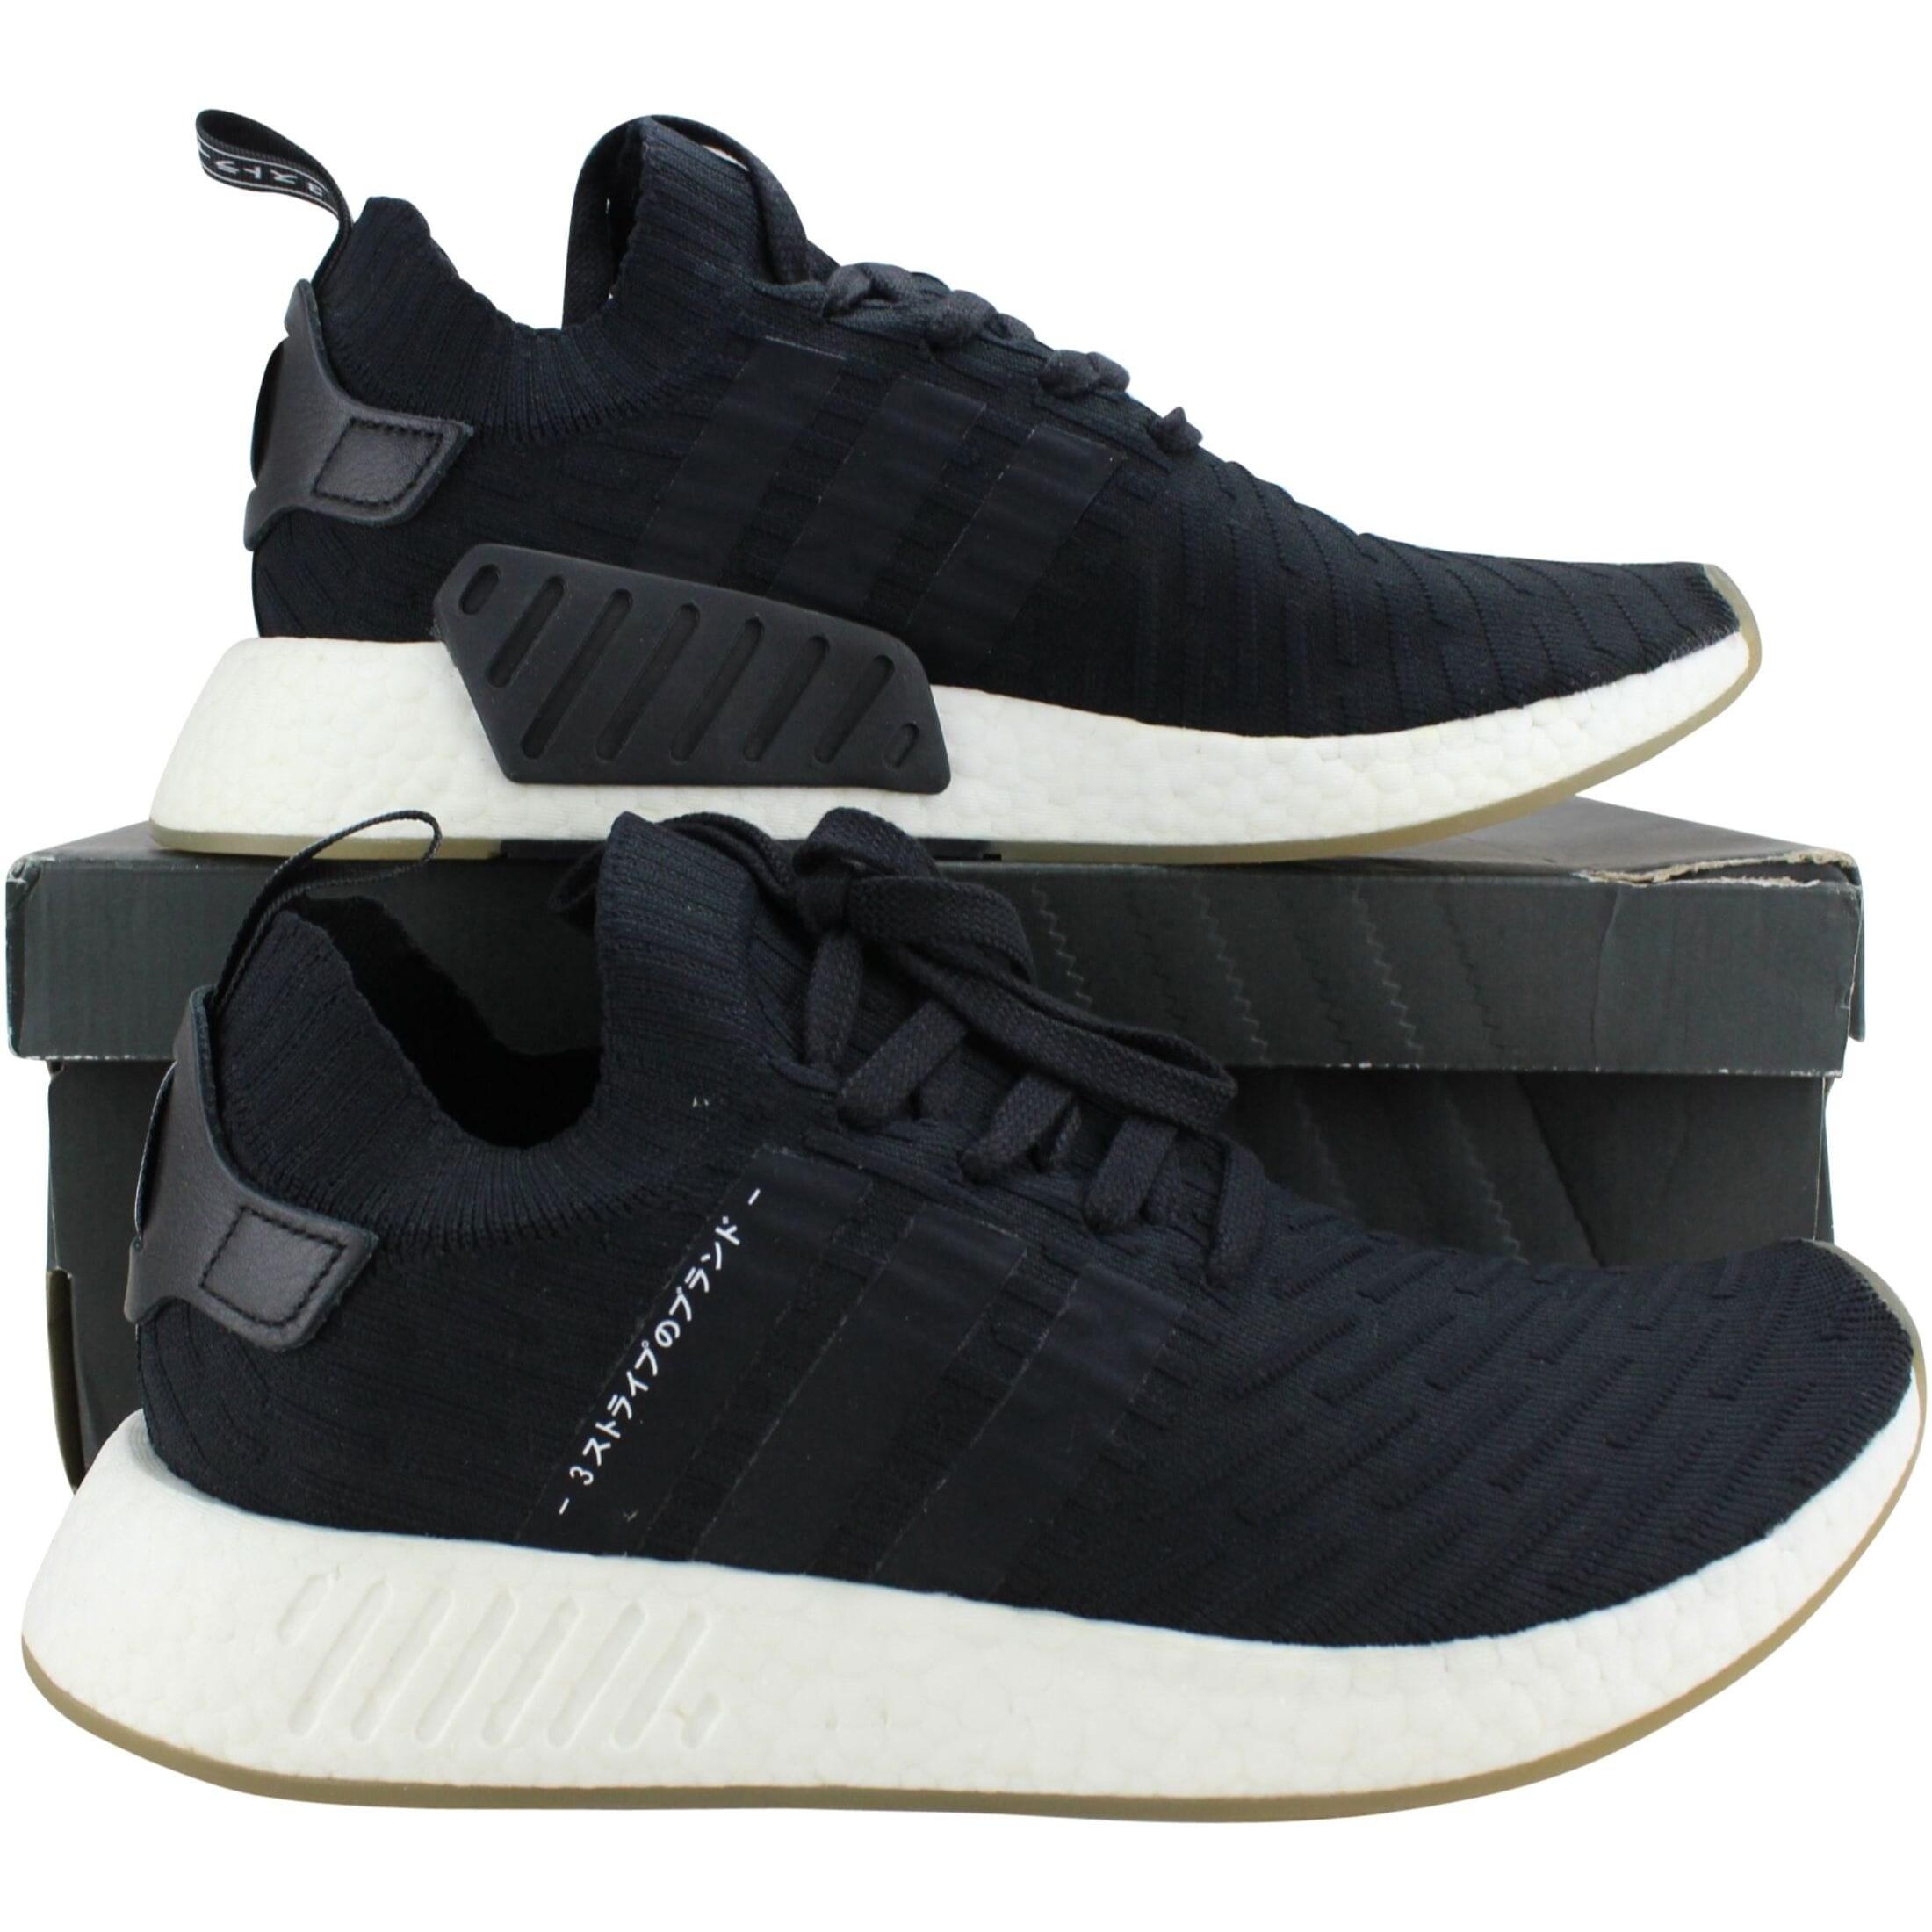 Adidas NMD R2 PK Core Black BY9696 Men's